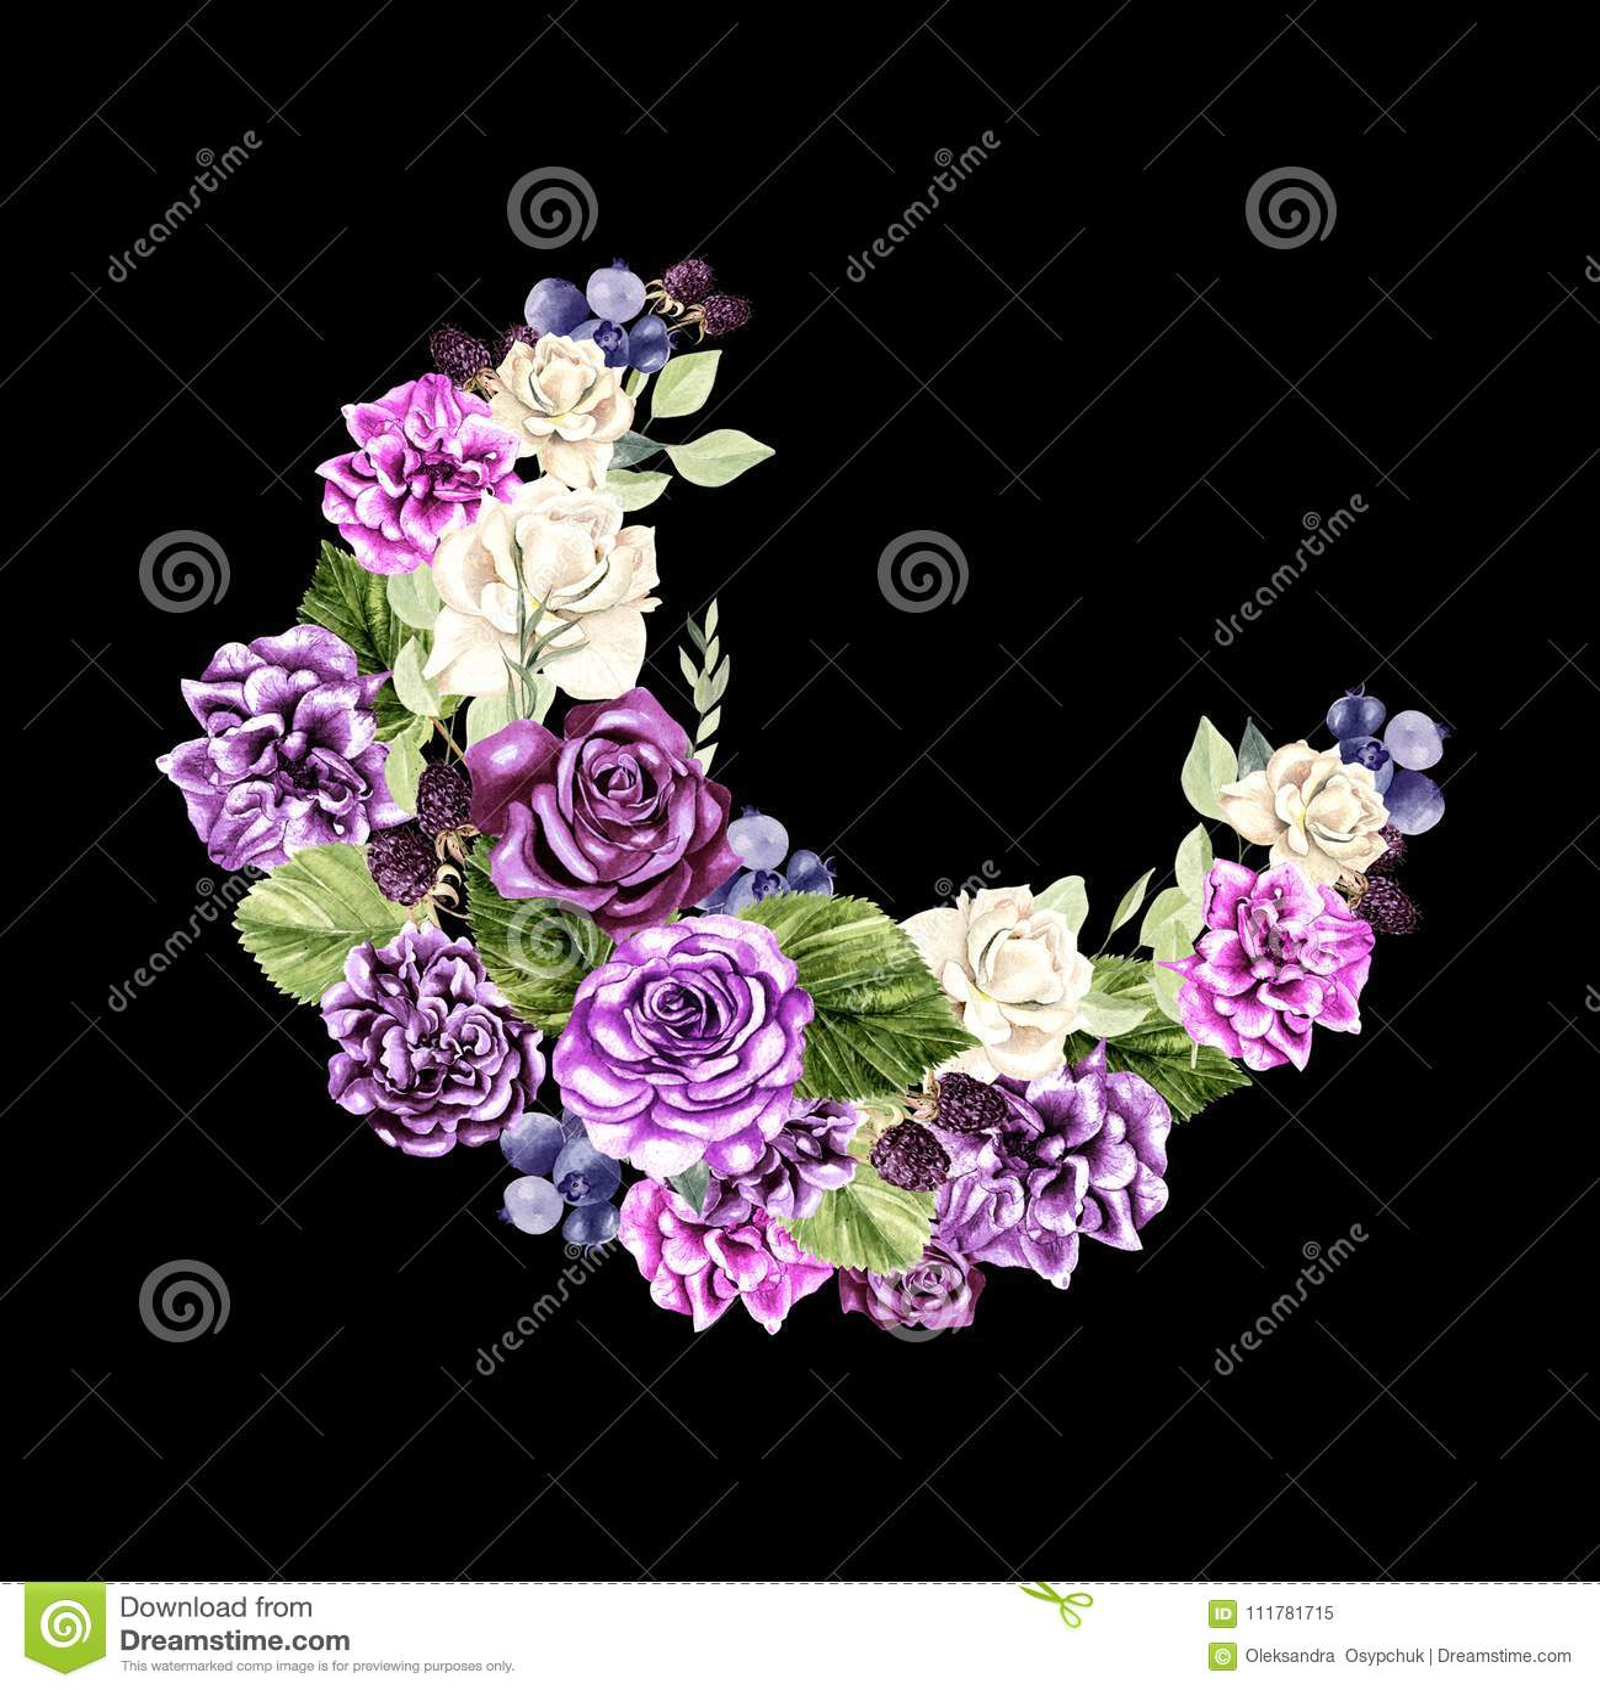 Piękny, jaskrawy akwarela wianek z różami, peonia, eukaliptus i berryes,